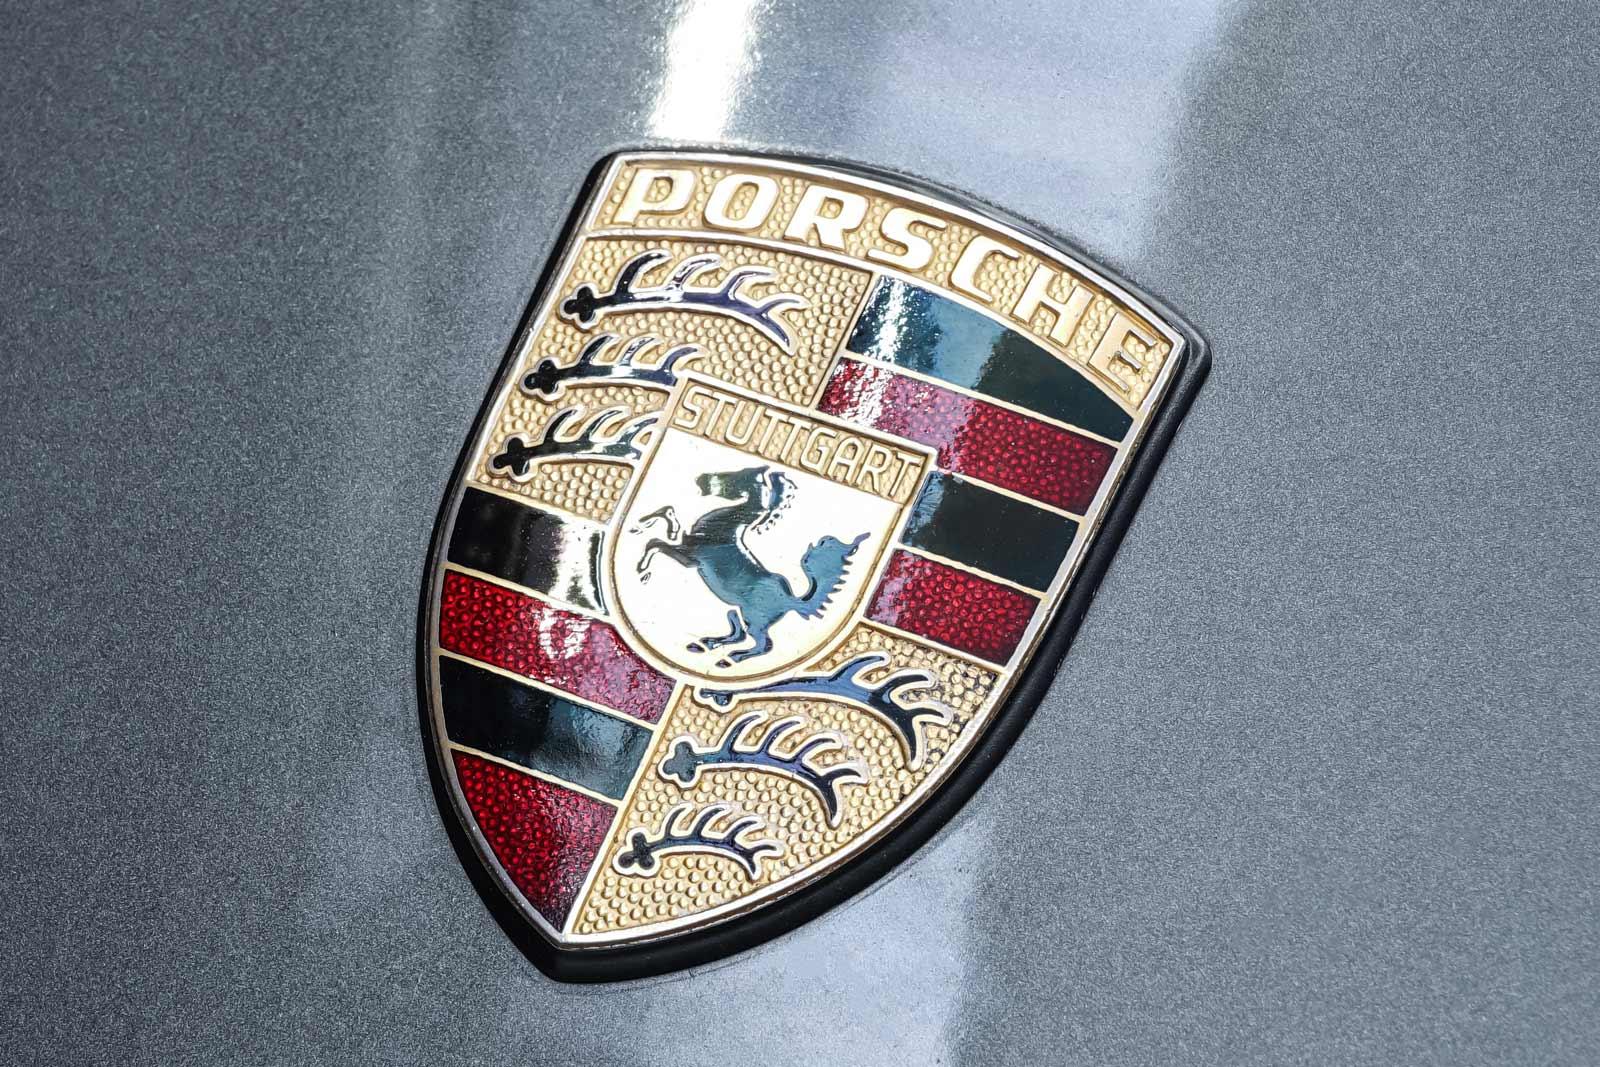 Porsche_986_Targa_Grau_Pink_POR-1092_11_w